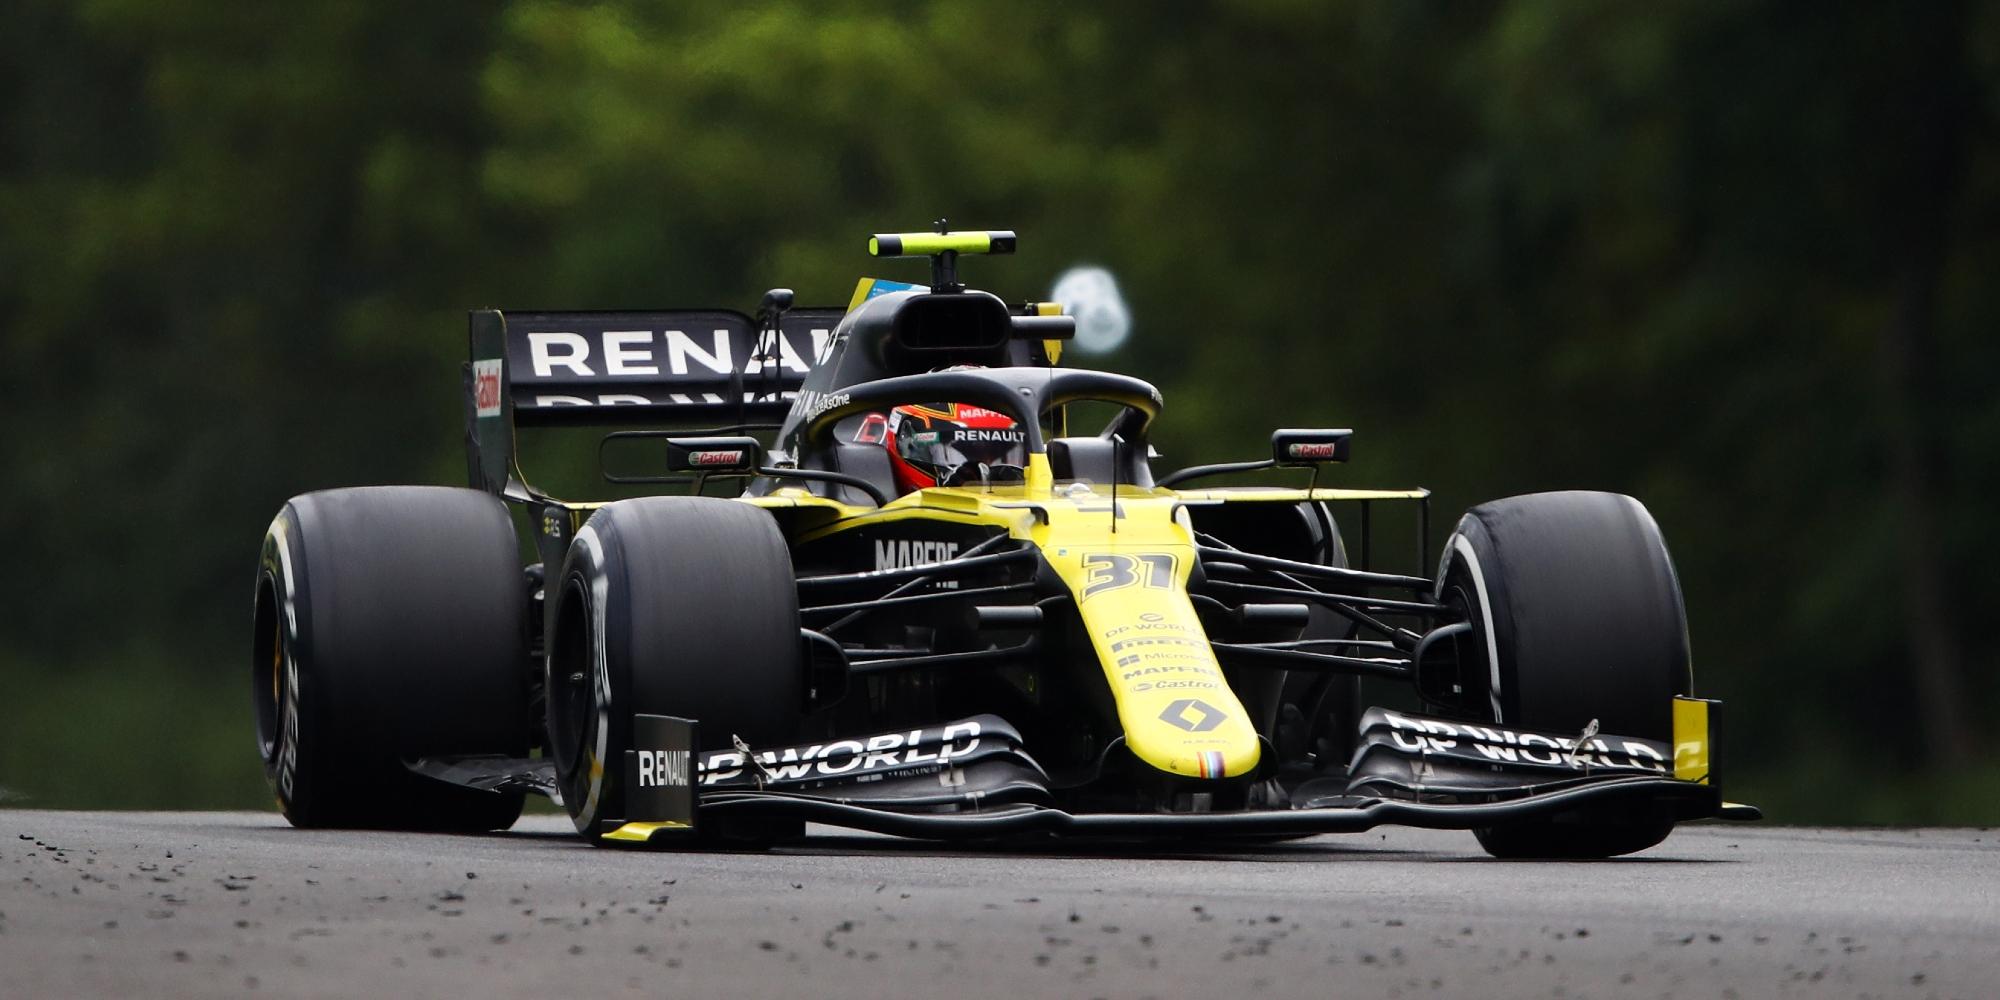 Esteban Ocon, 2020 Hungarian GP